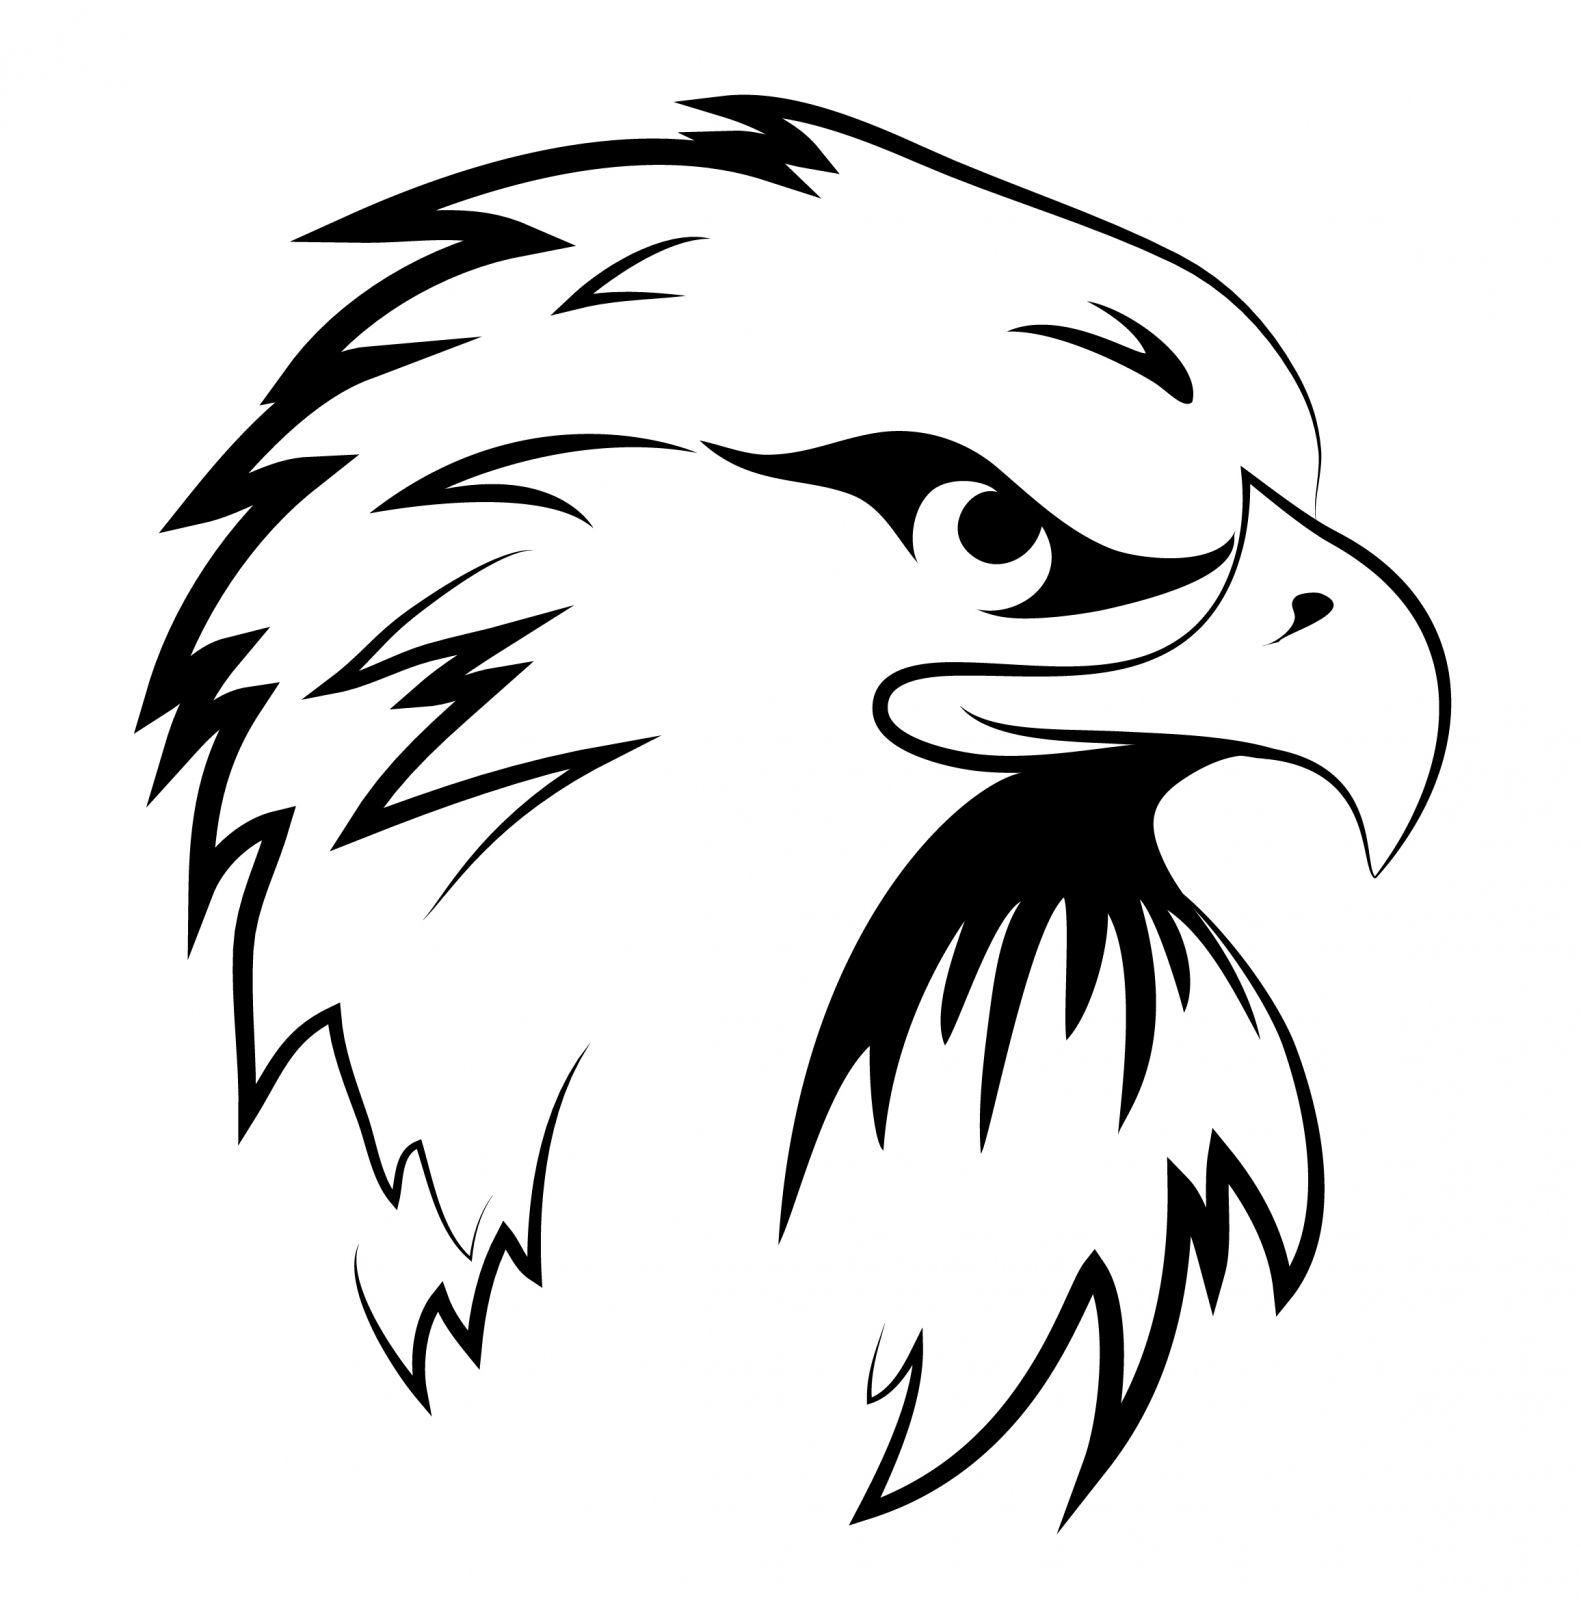 Eagle head clipart black and white jpg transparent stock Black and White Eagle Head Clipart | Eagle Coloring Pages | Eagle ... jpg transparent stock